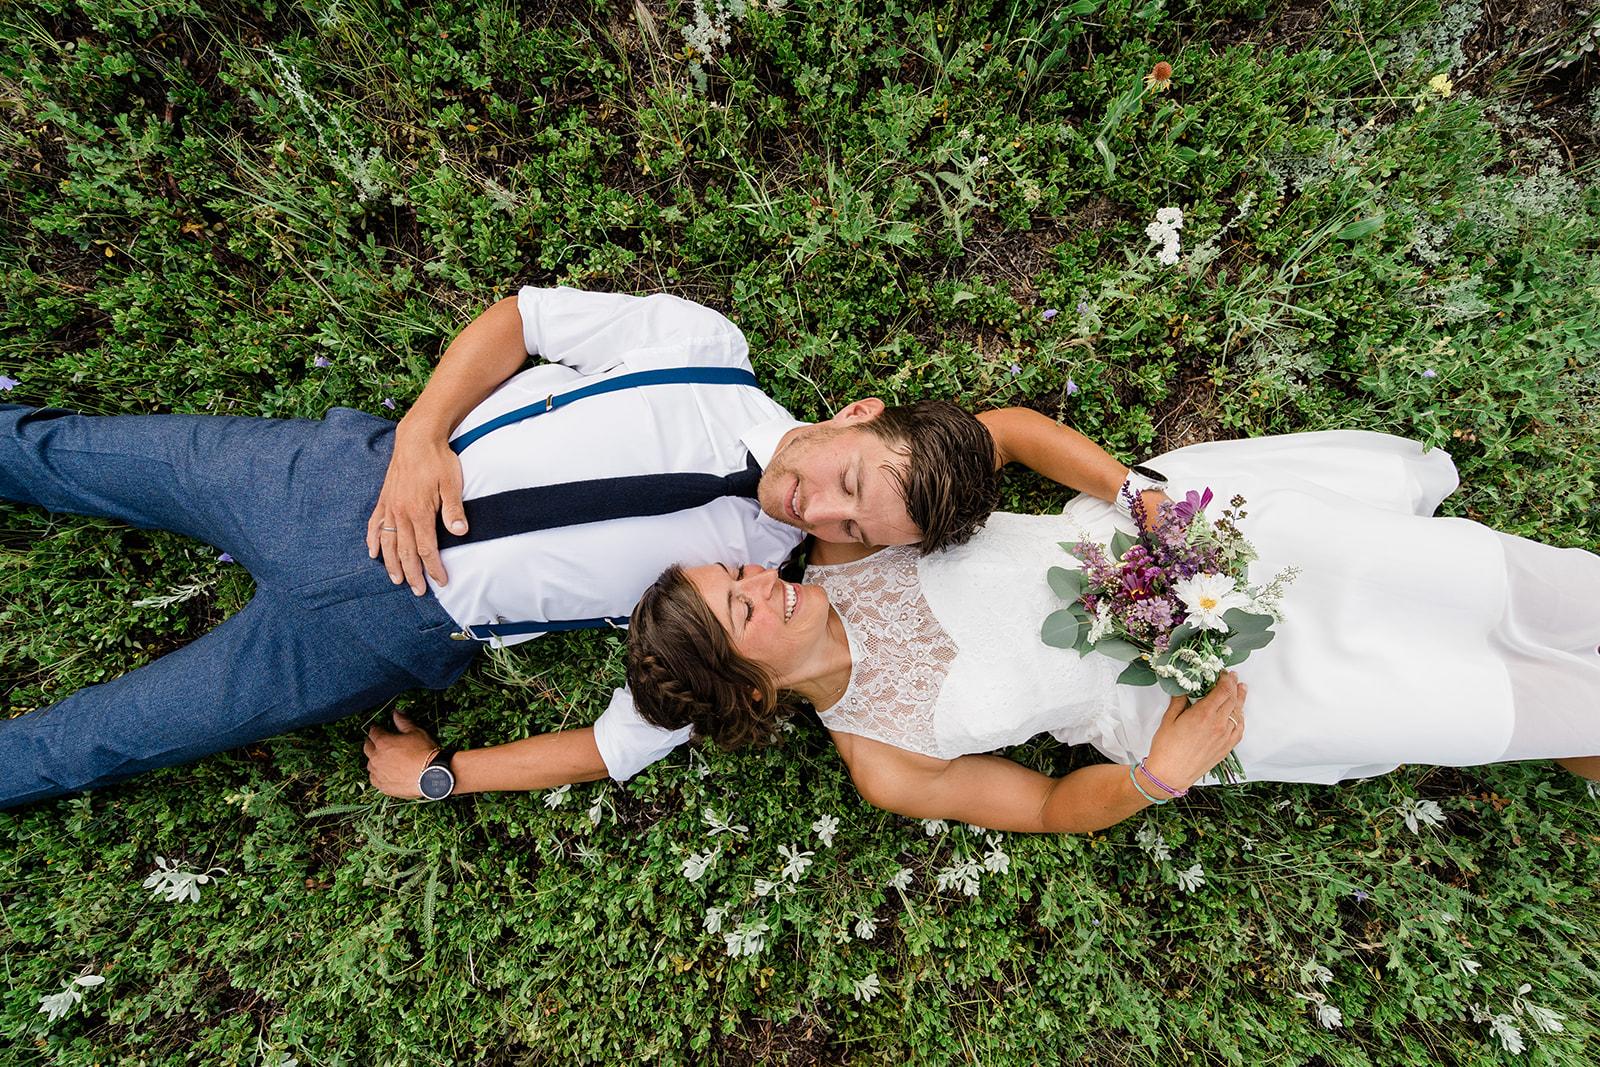 20190726 _ Colorado _ Aletta and Koen _ Micro Weddings _ Noah Berg Photography-229_websize.jpg